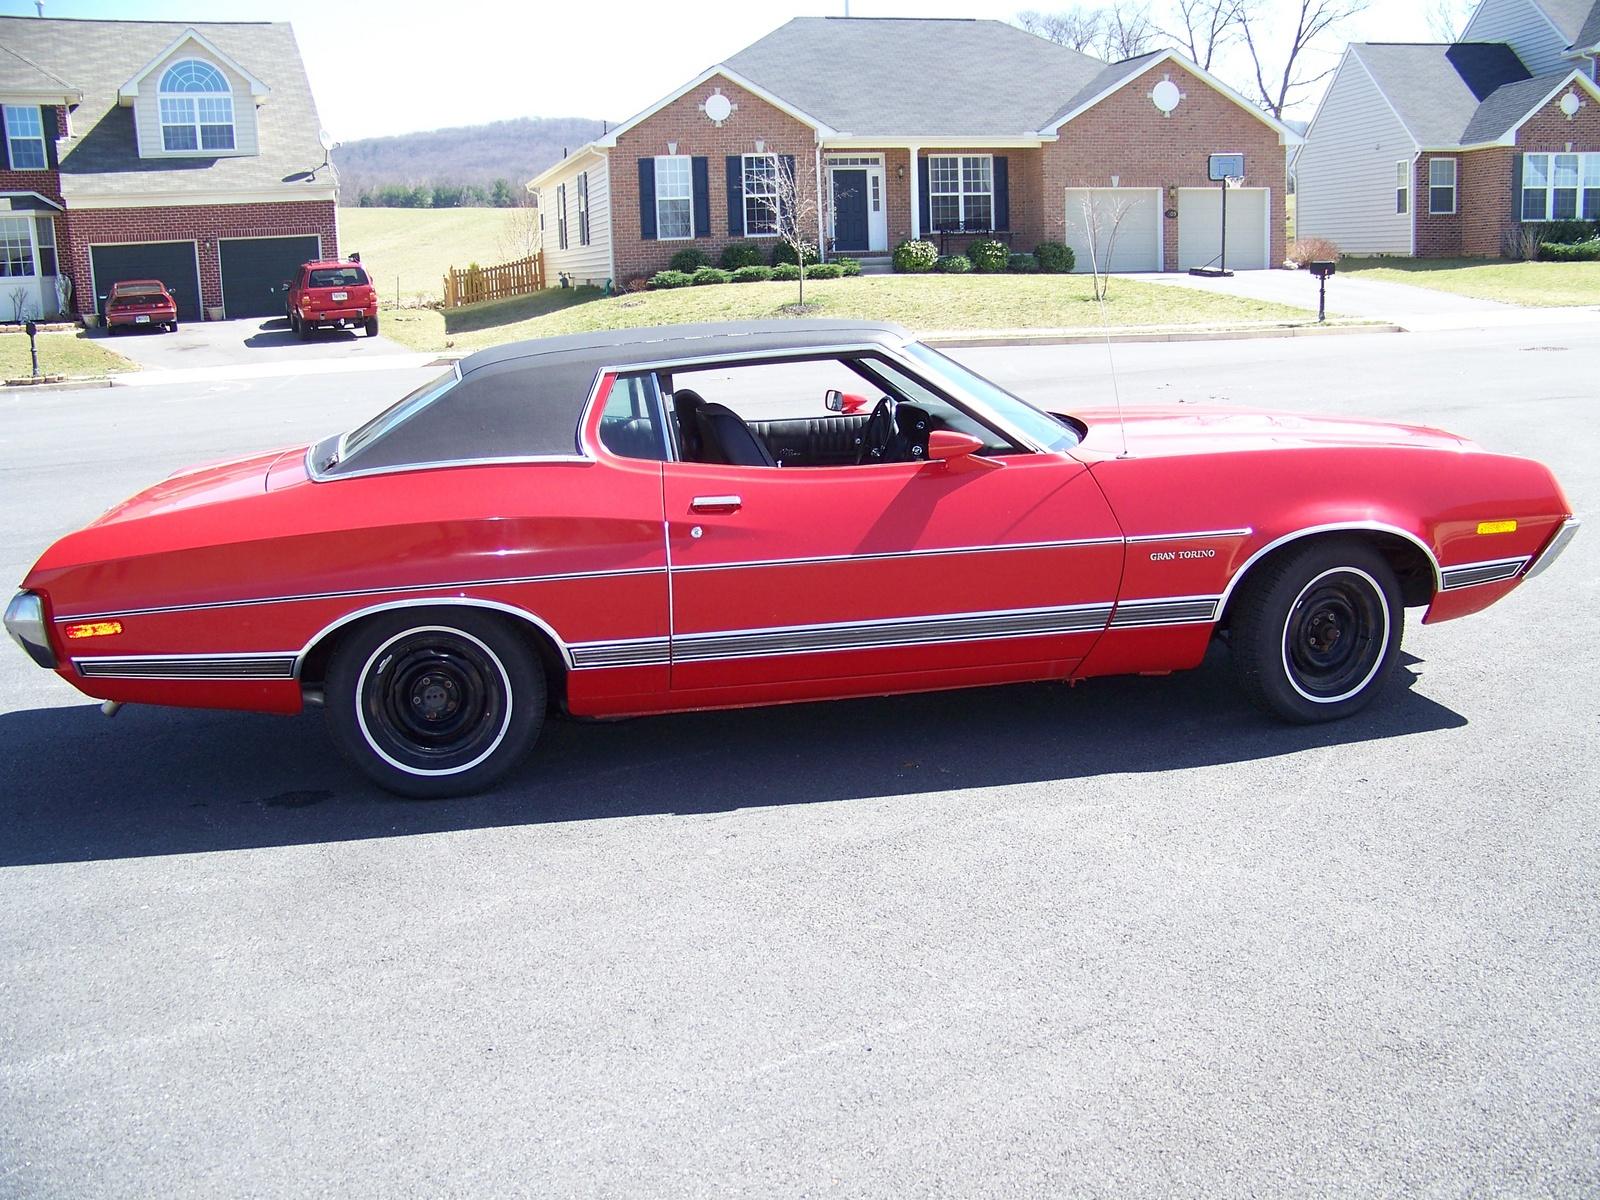 1972 Gran Torino For Sale Craigslist >> 1972 Ford torino craigslist